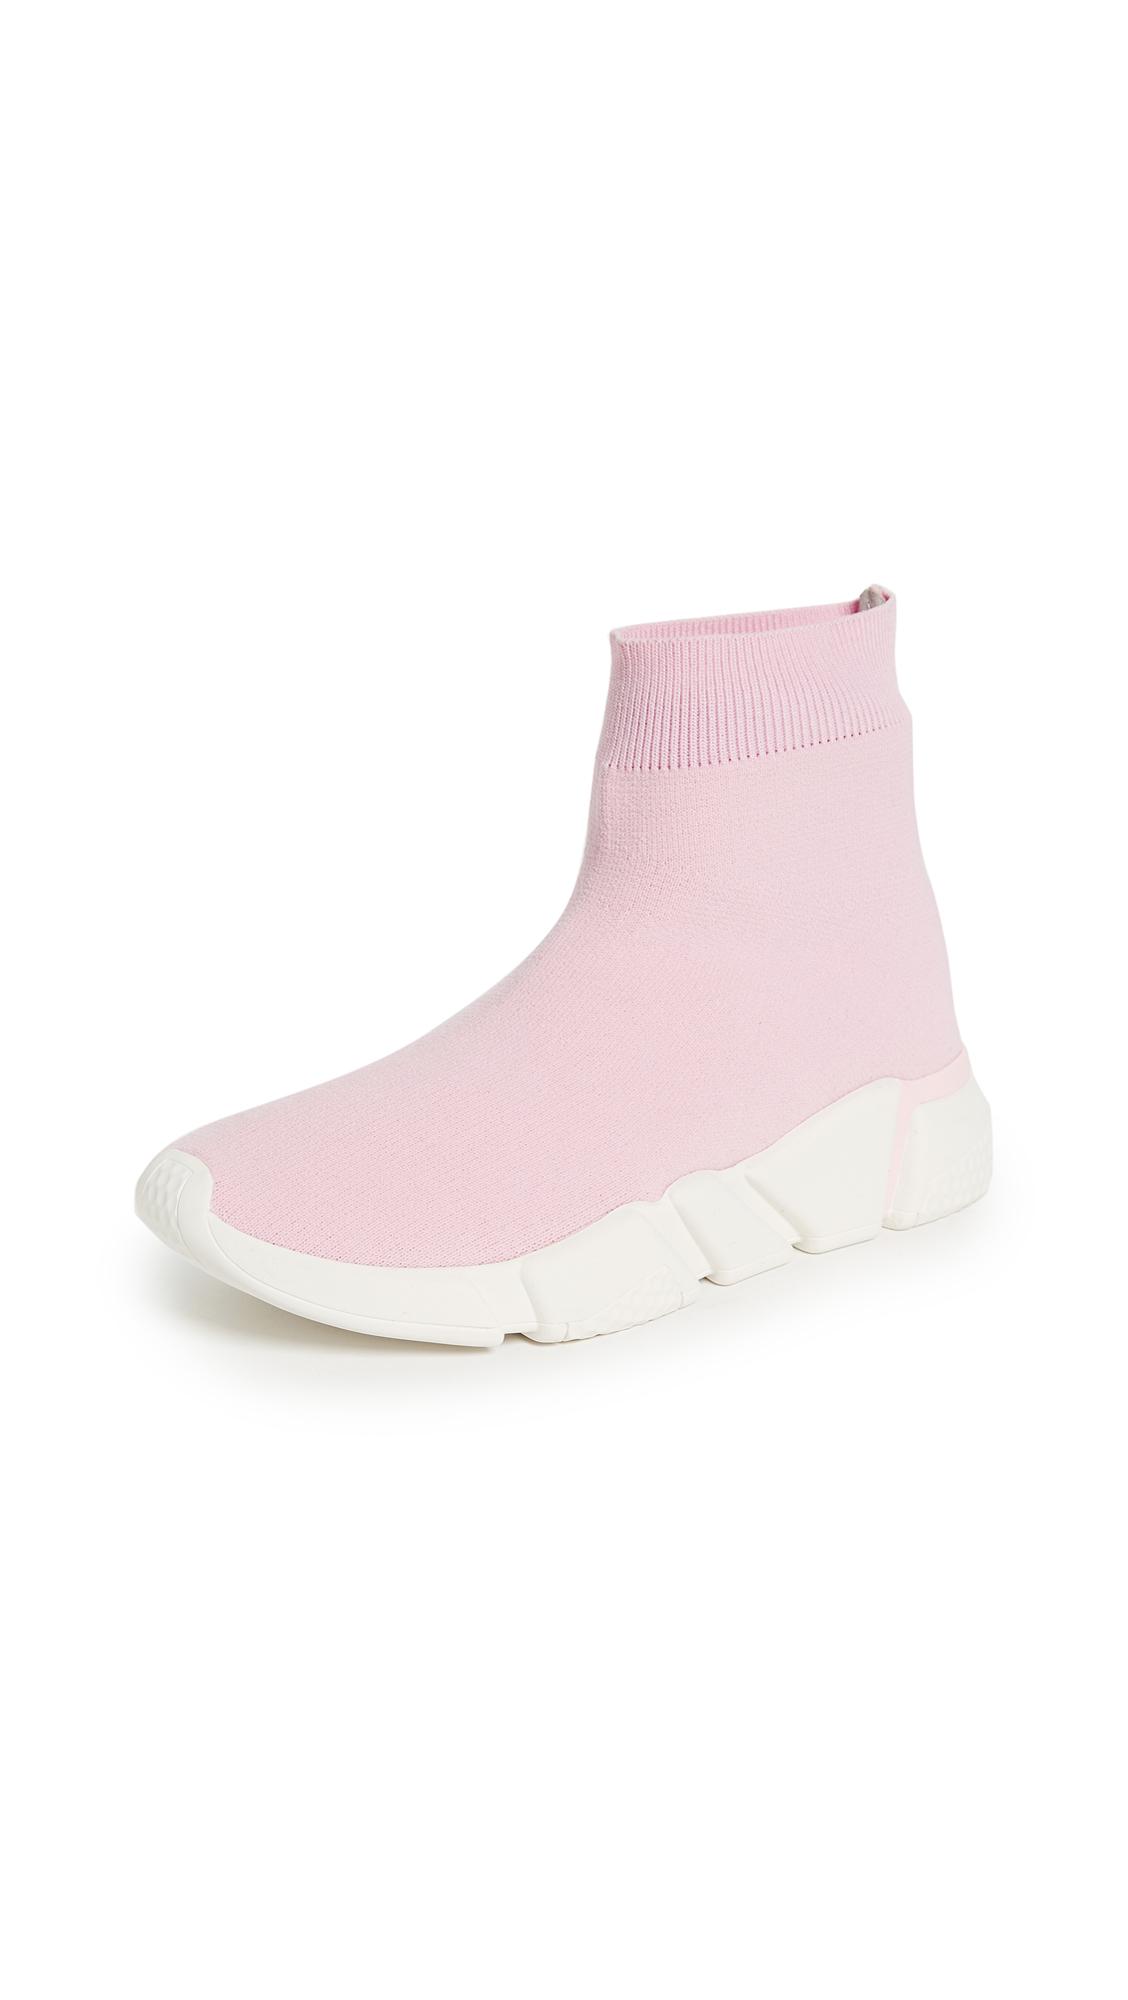 Jeffrey Campbell Redman Joggers - Pink